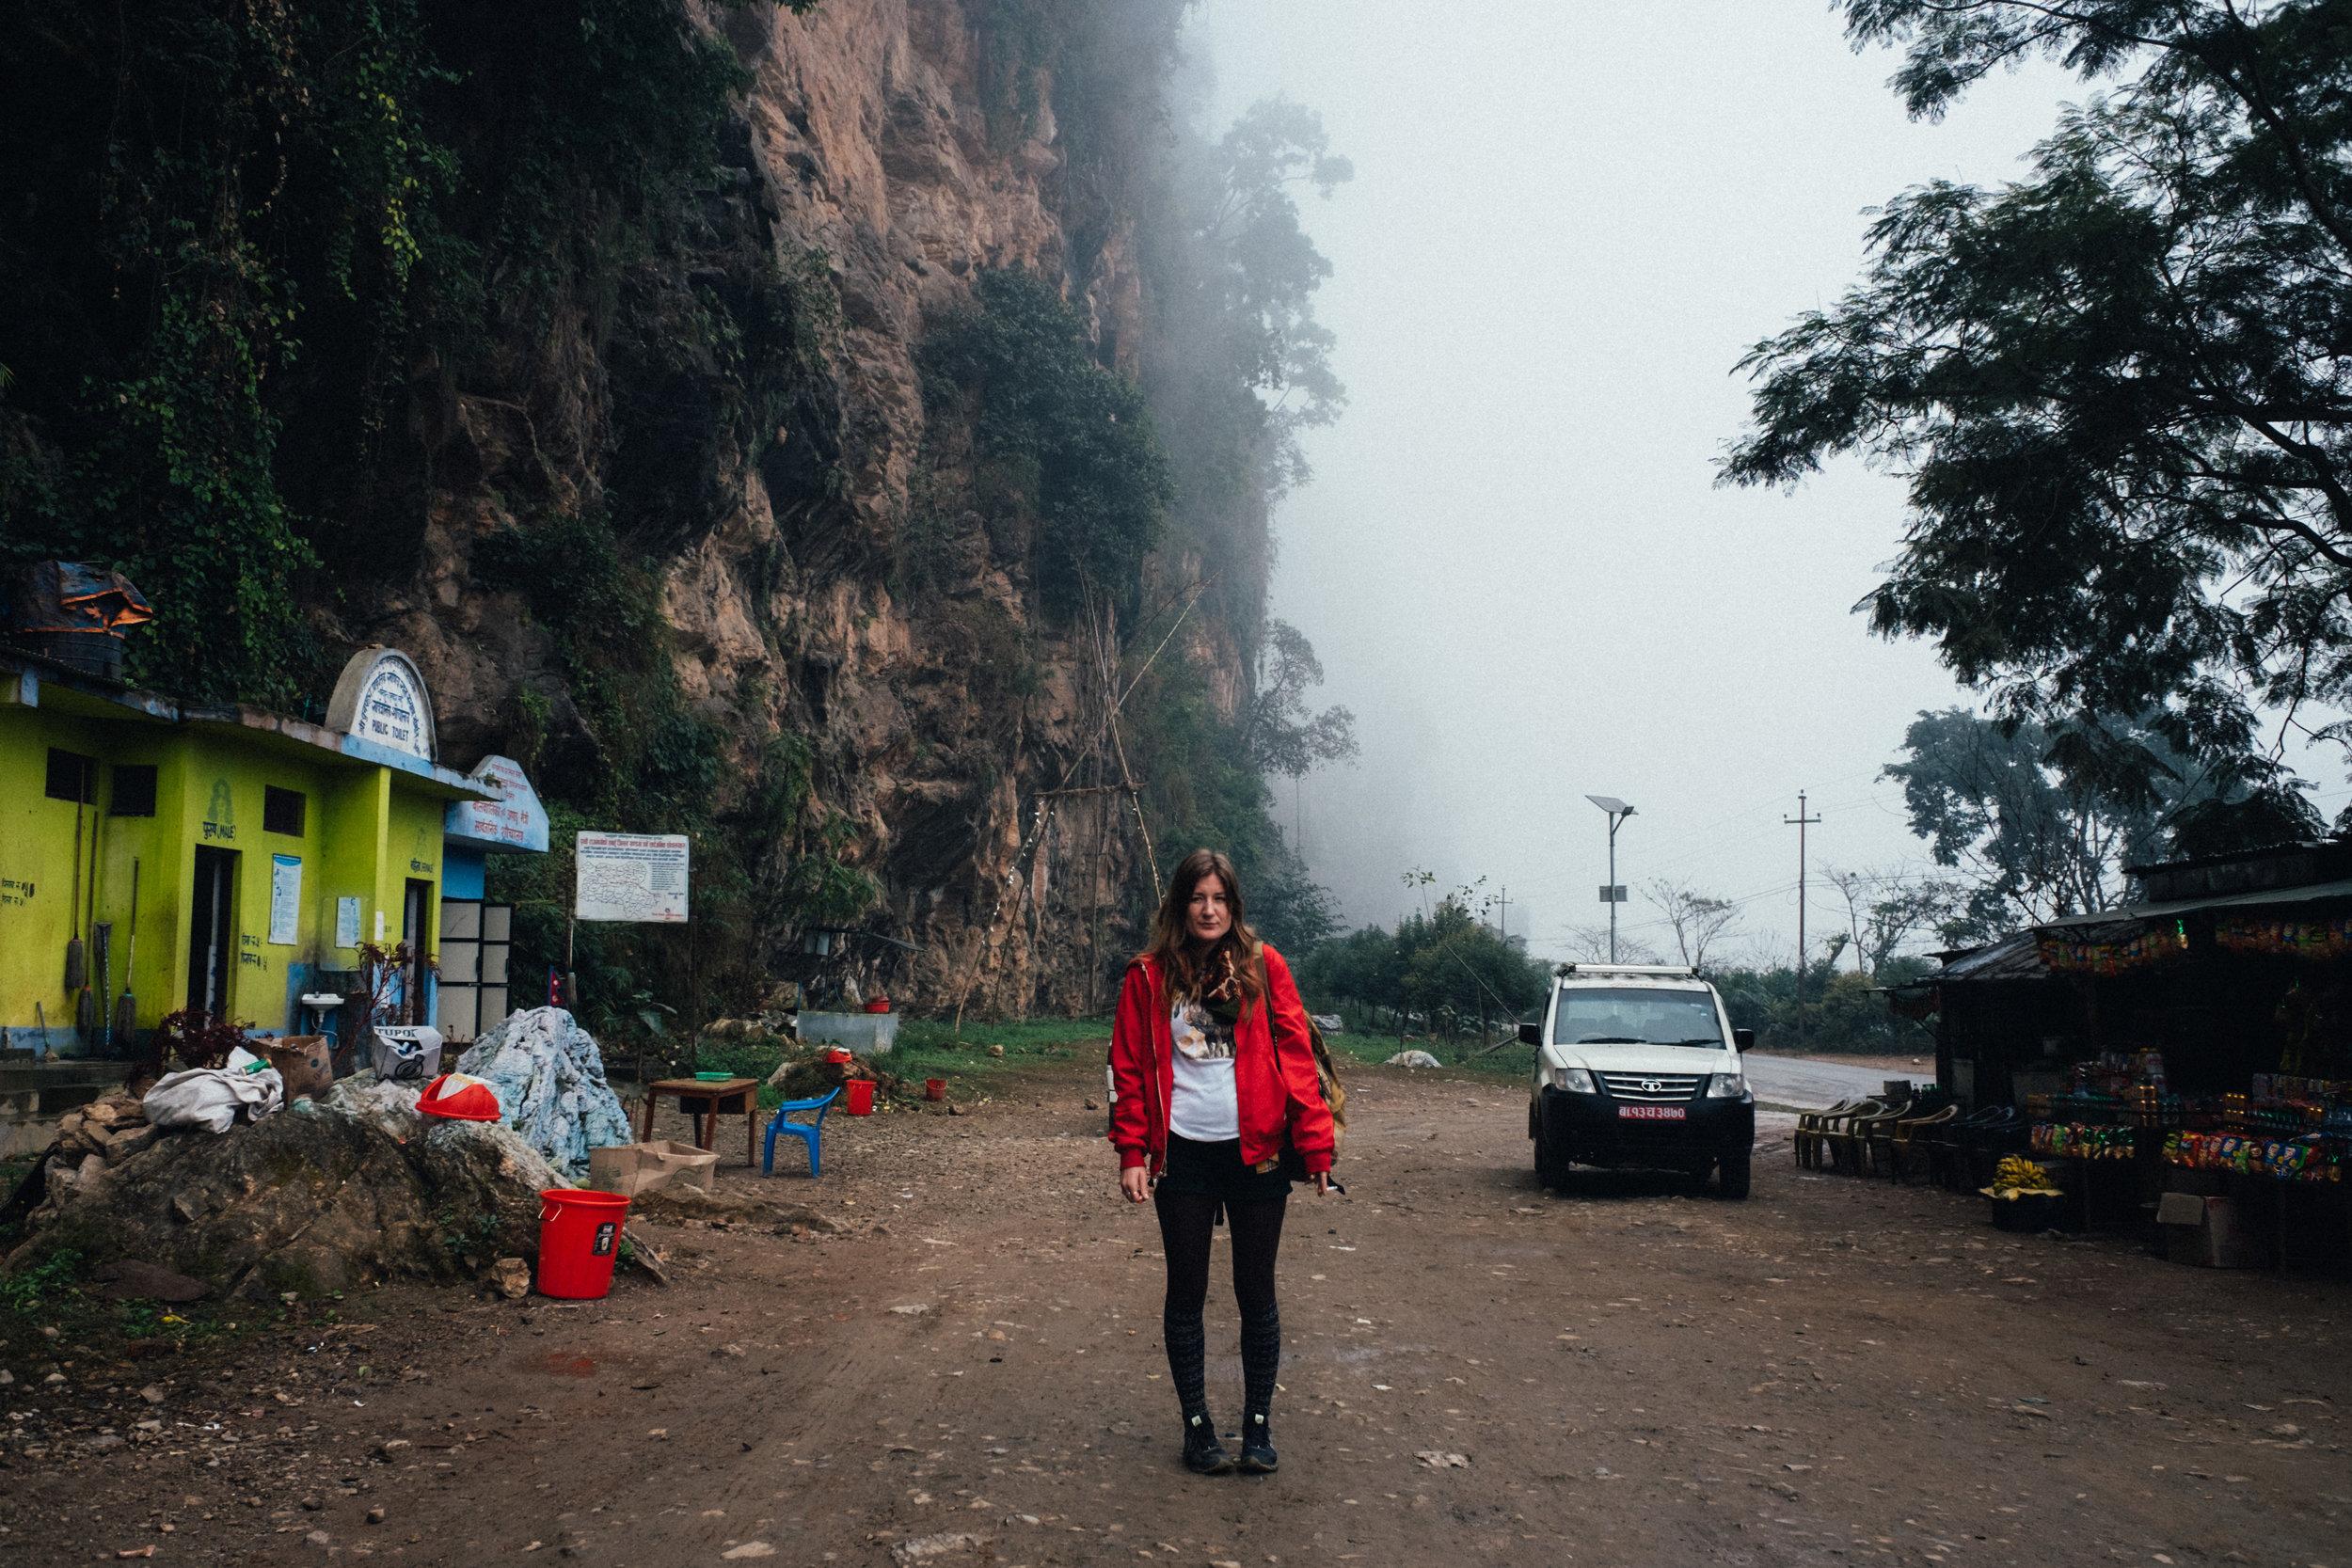 A ride through misty mountains.